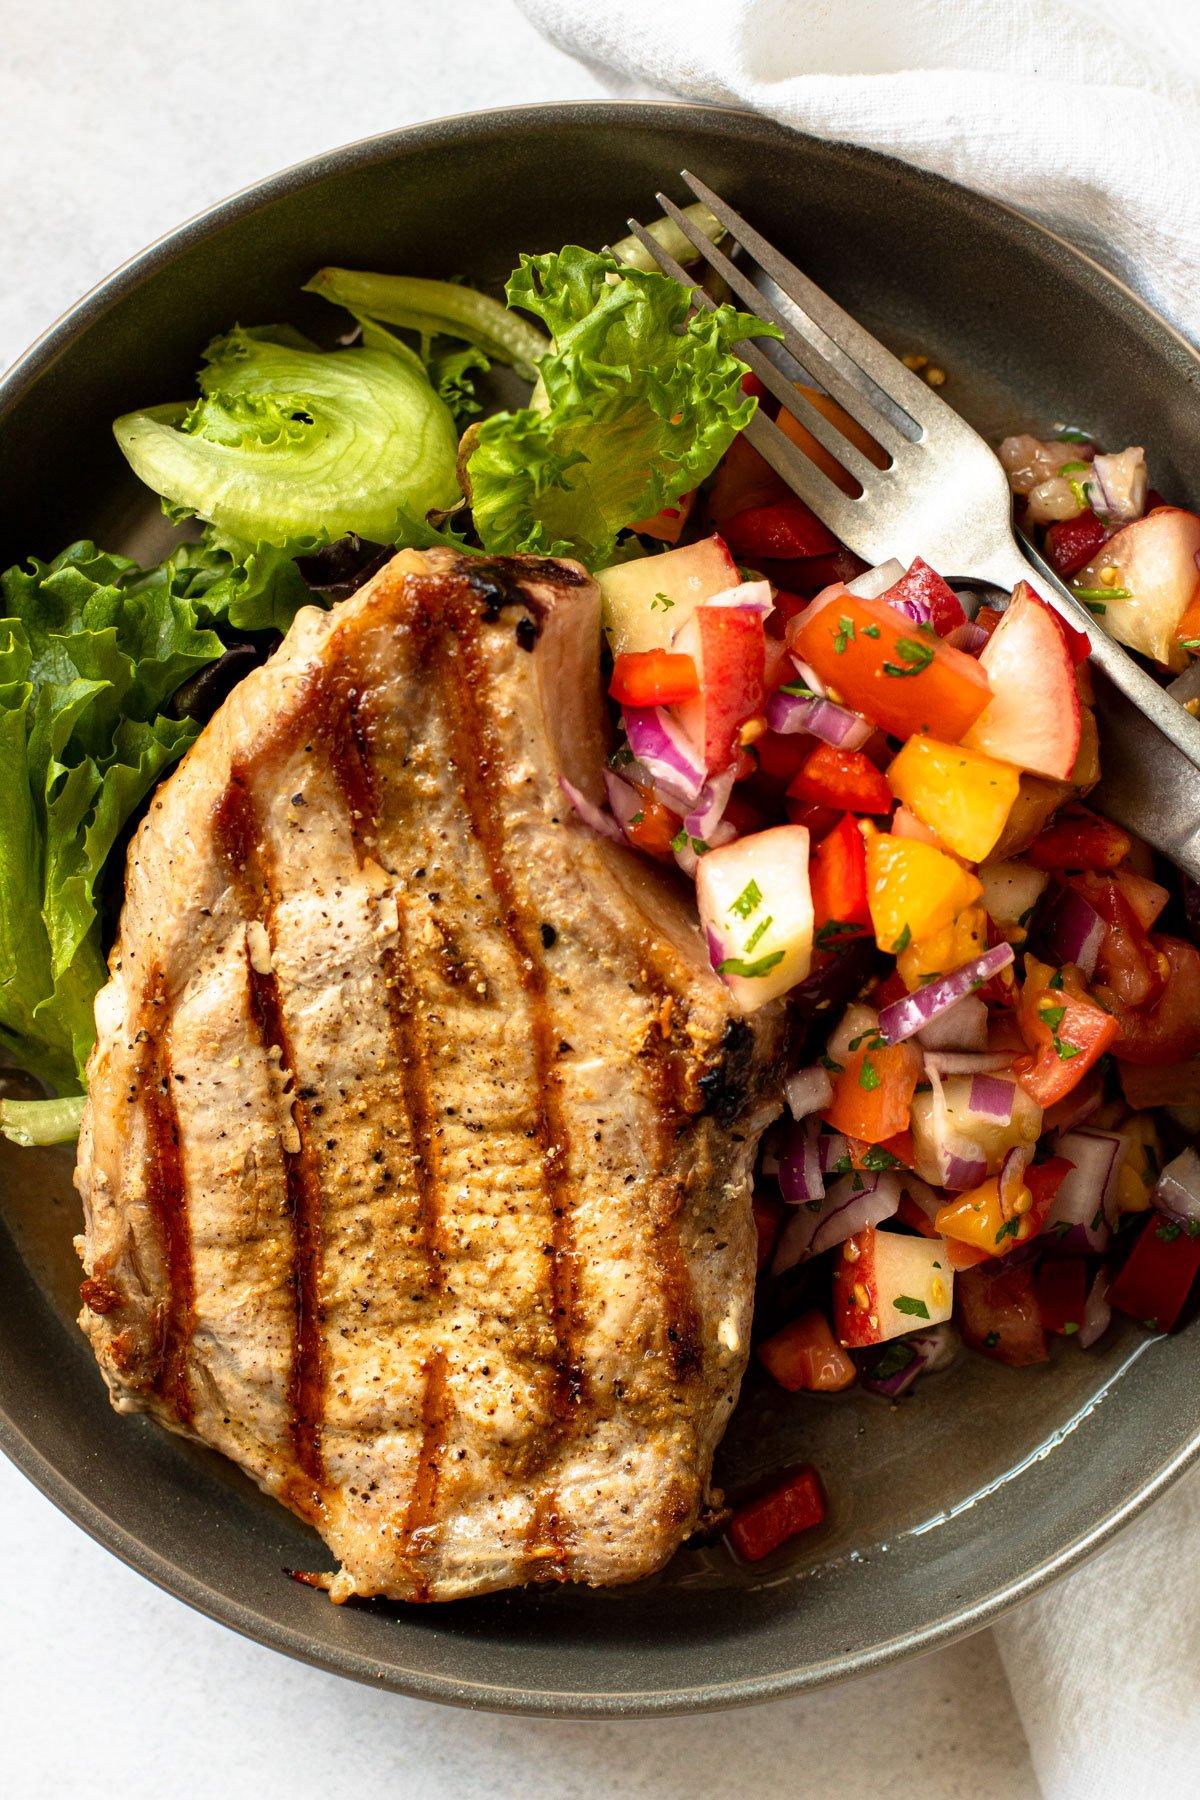 Grilled pork chop with peach salsa.